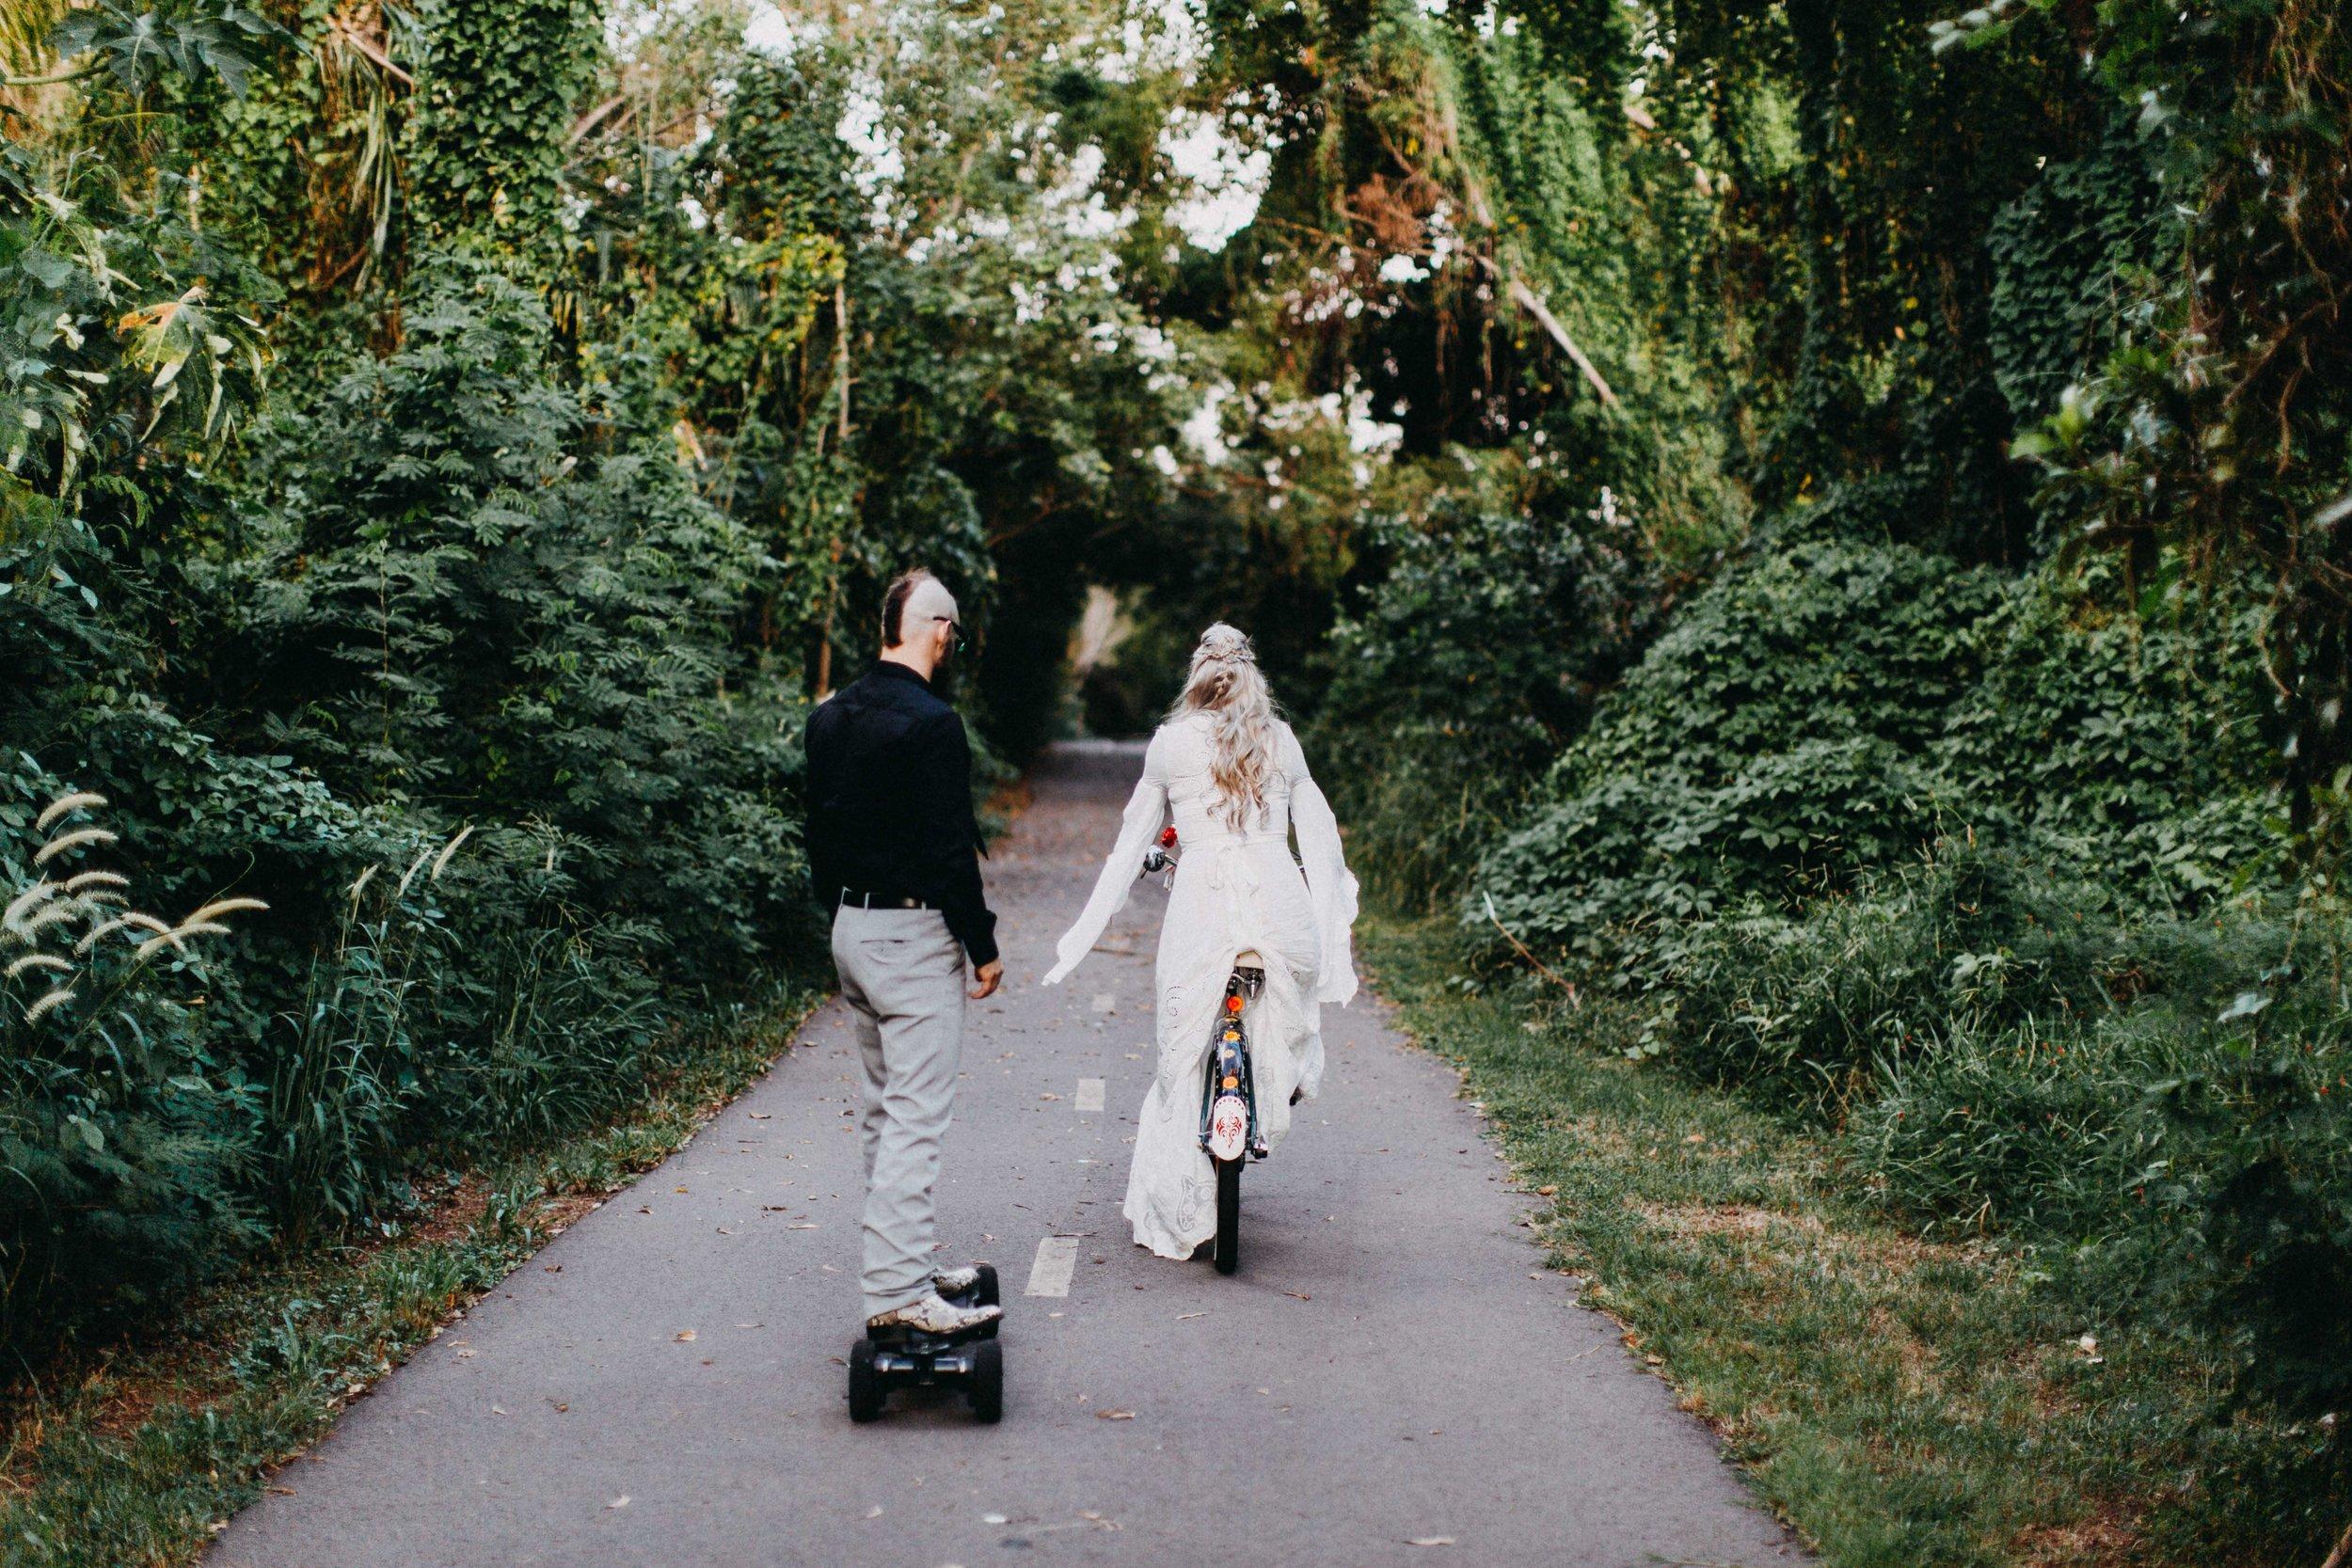 darwin-elopement-wedding-beach-camden-photography-www.emilyobrienphotography.net-45.jpg